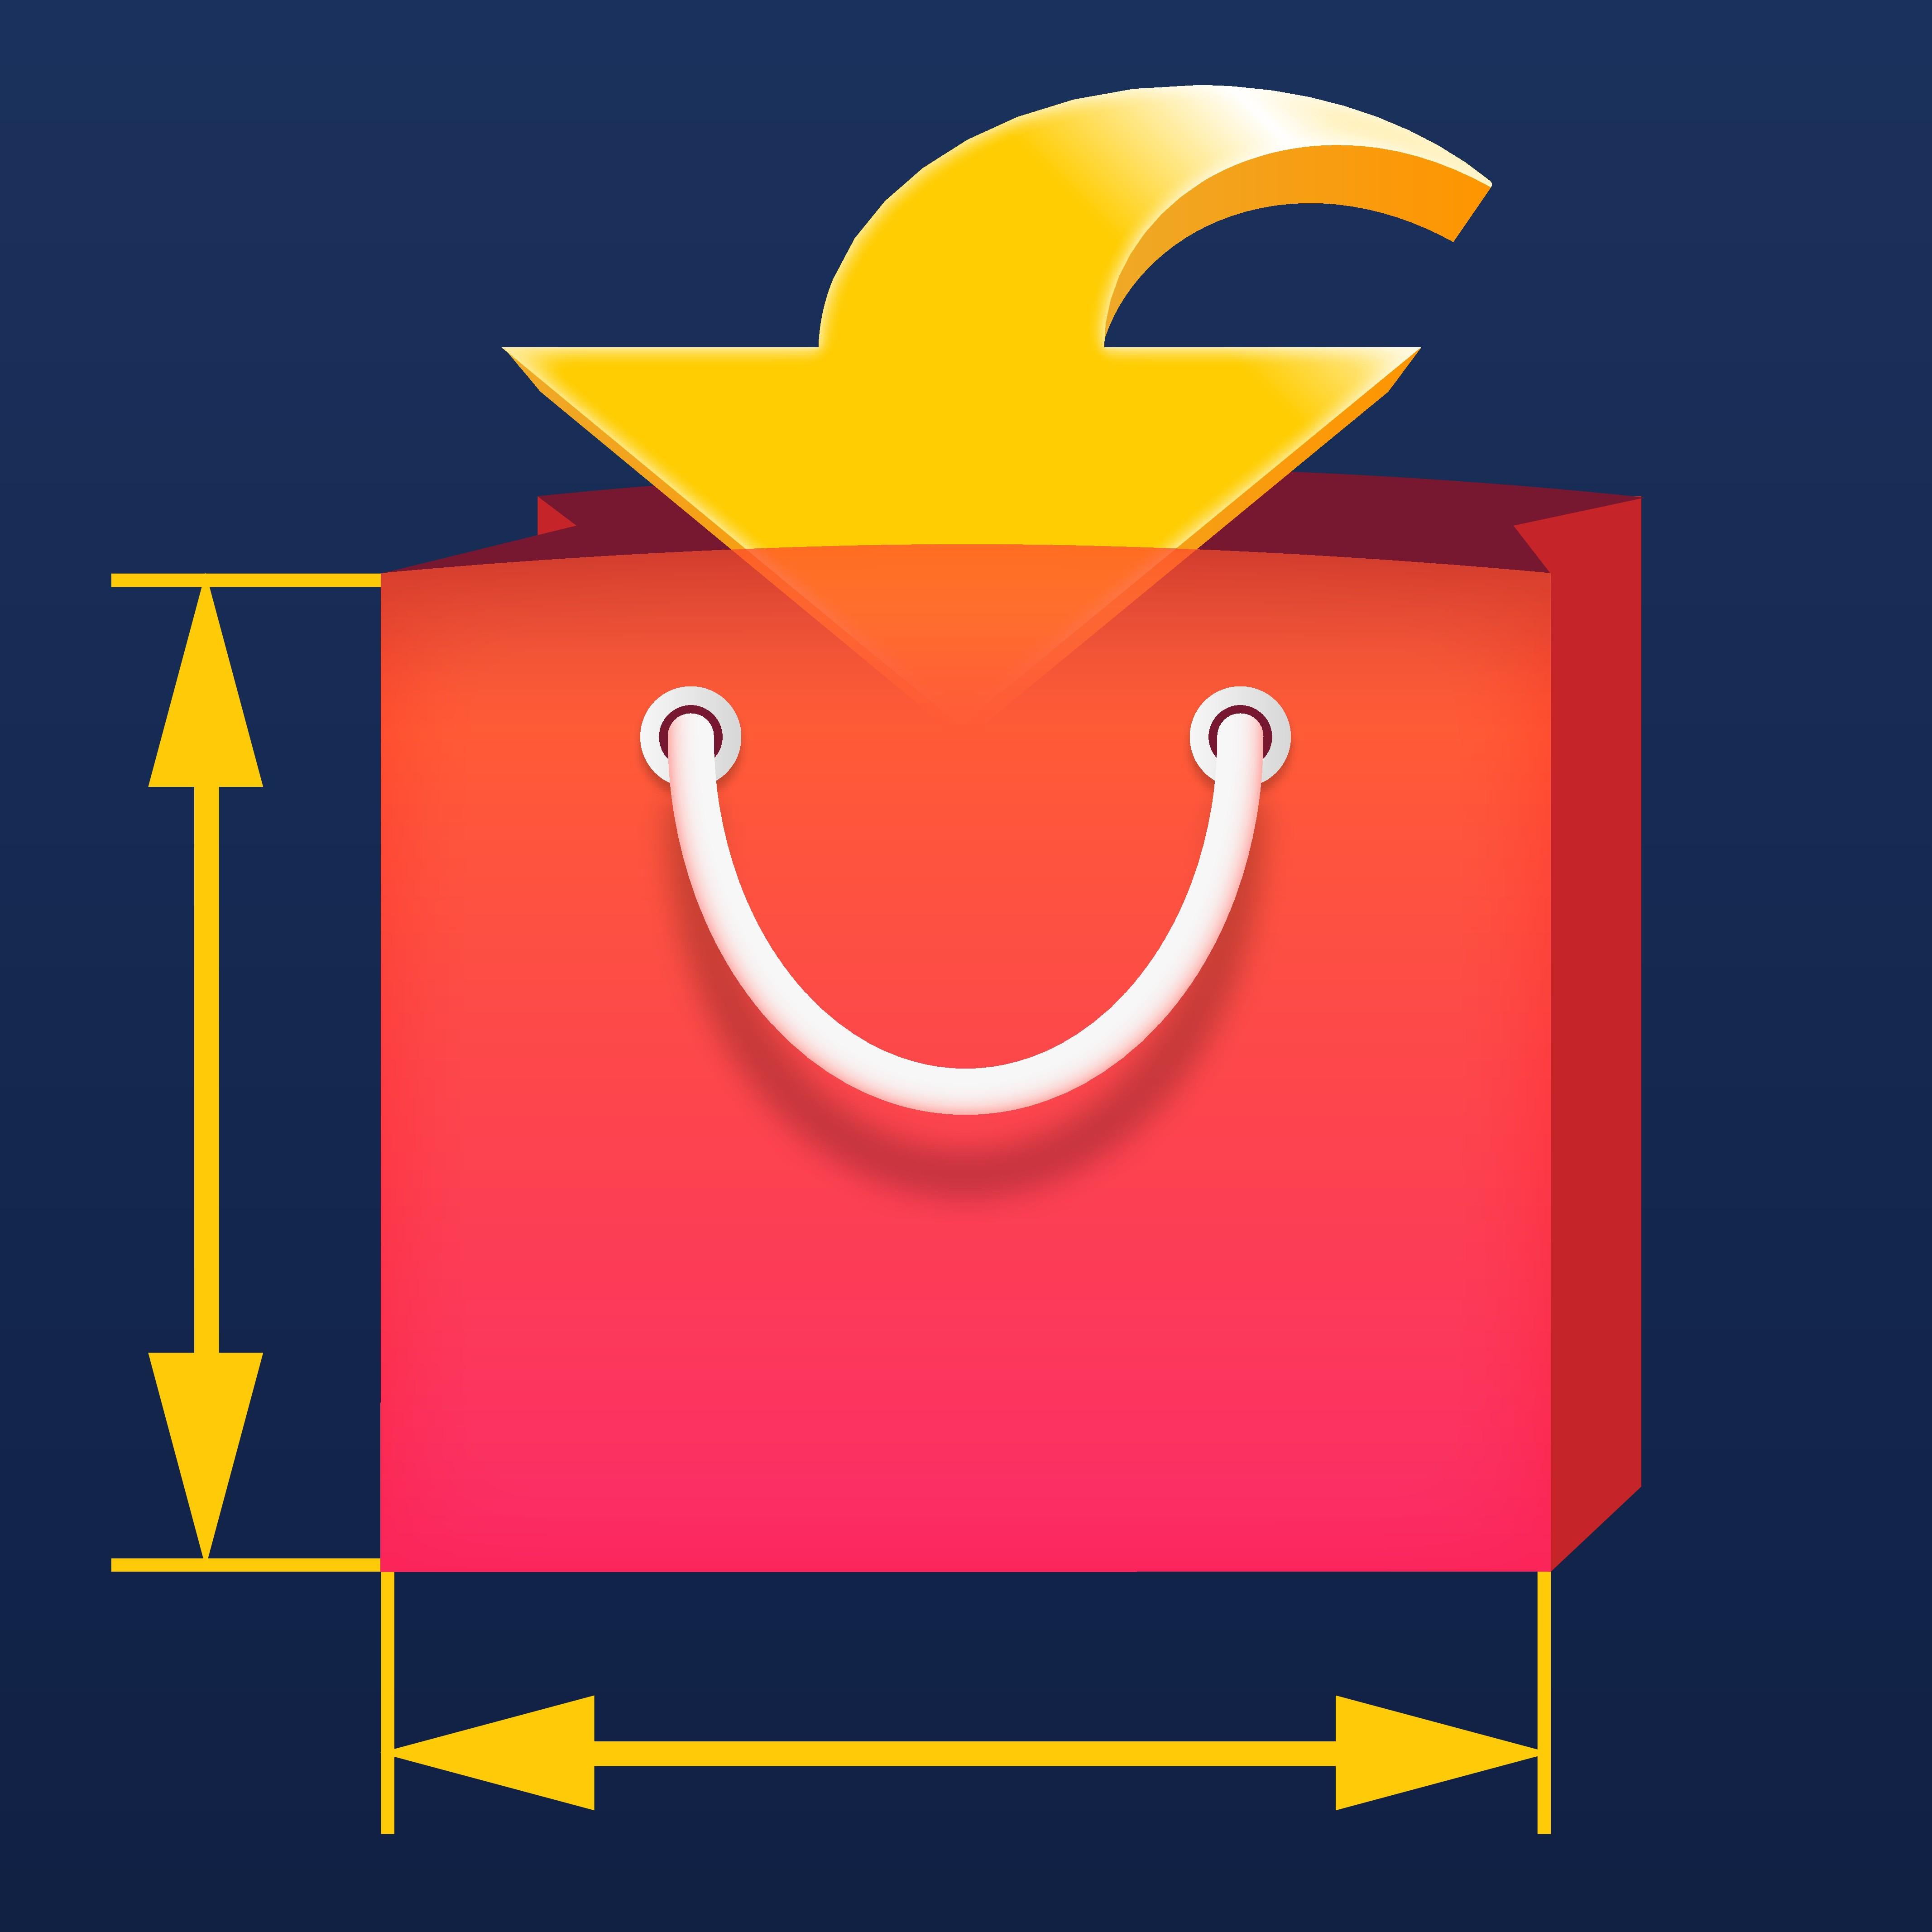 Create an App Icon for BagSure App